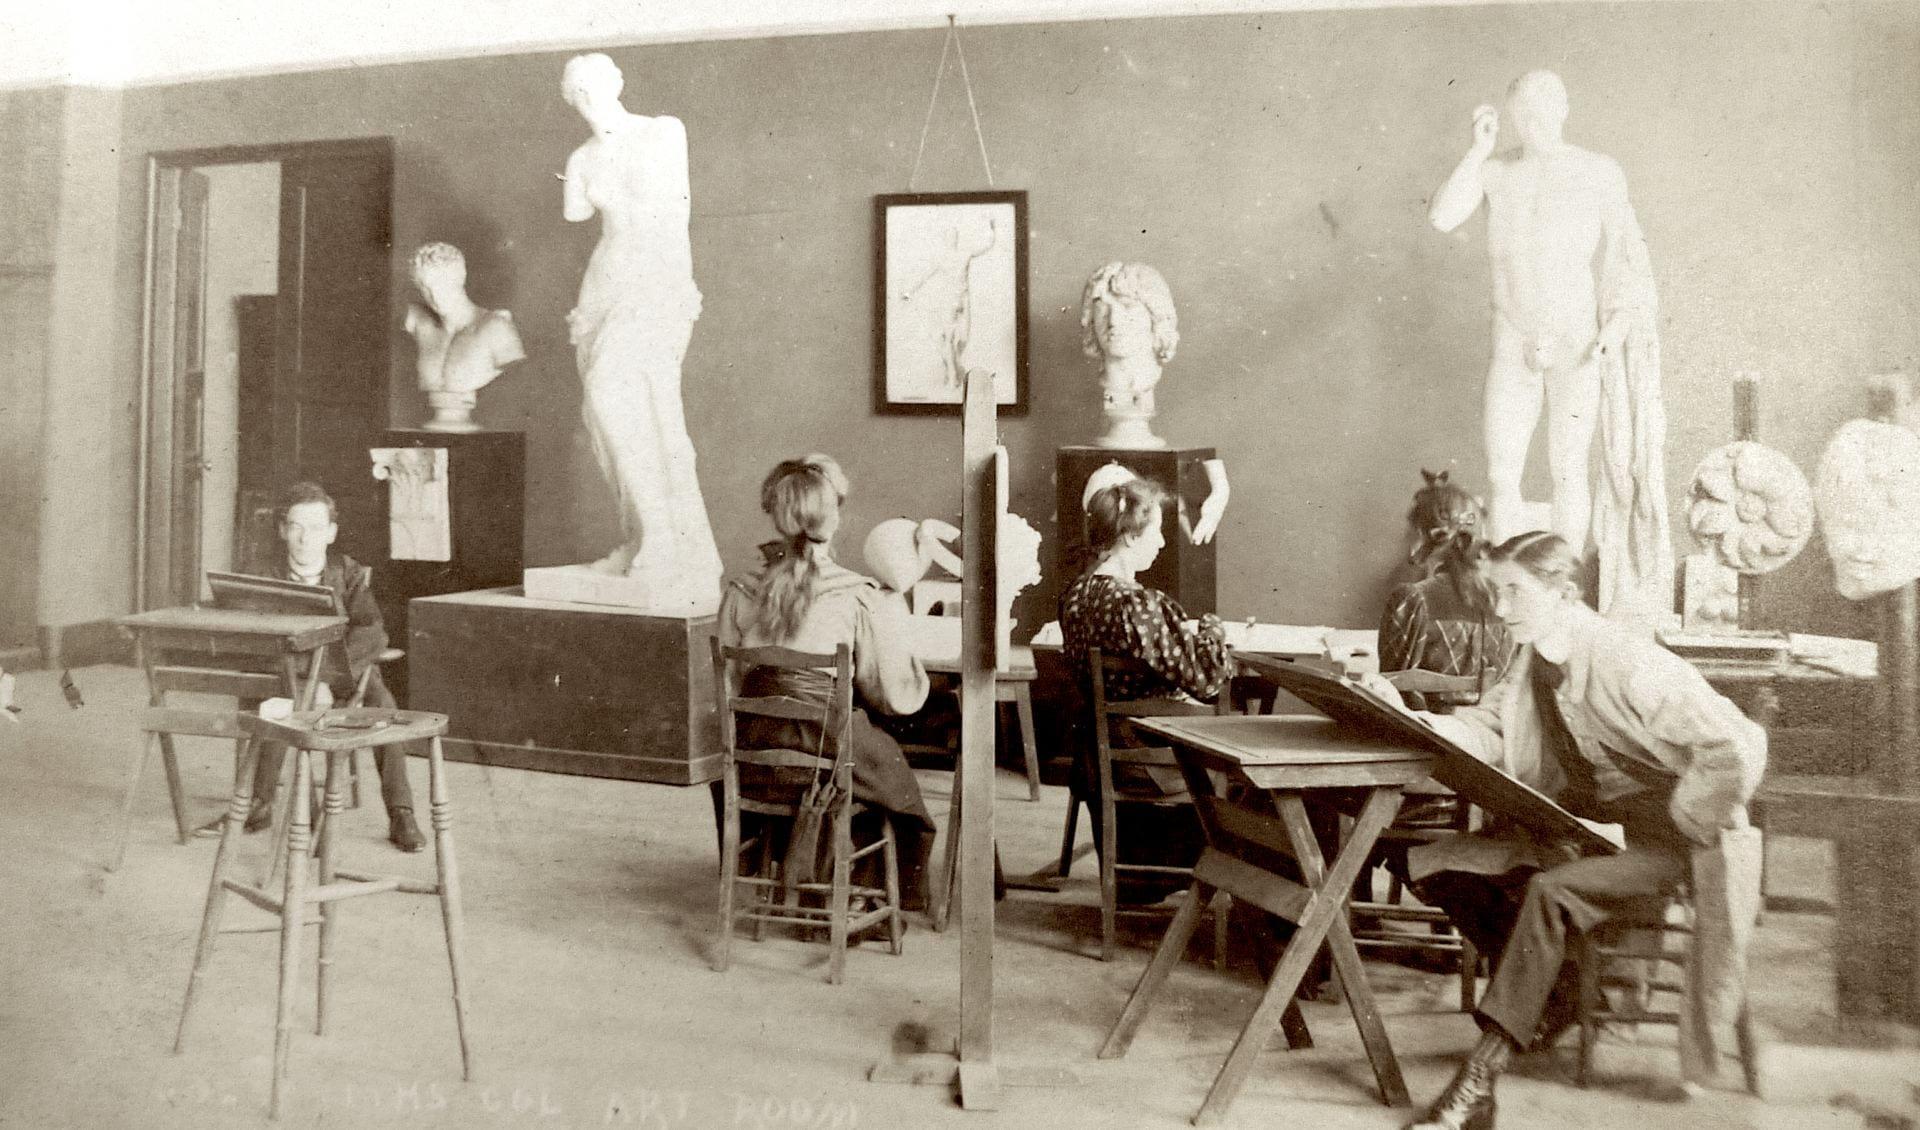 Goldsmiths Art students in 1908